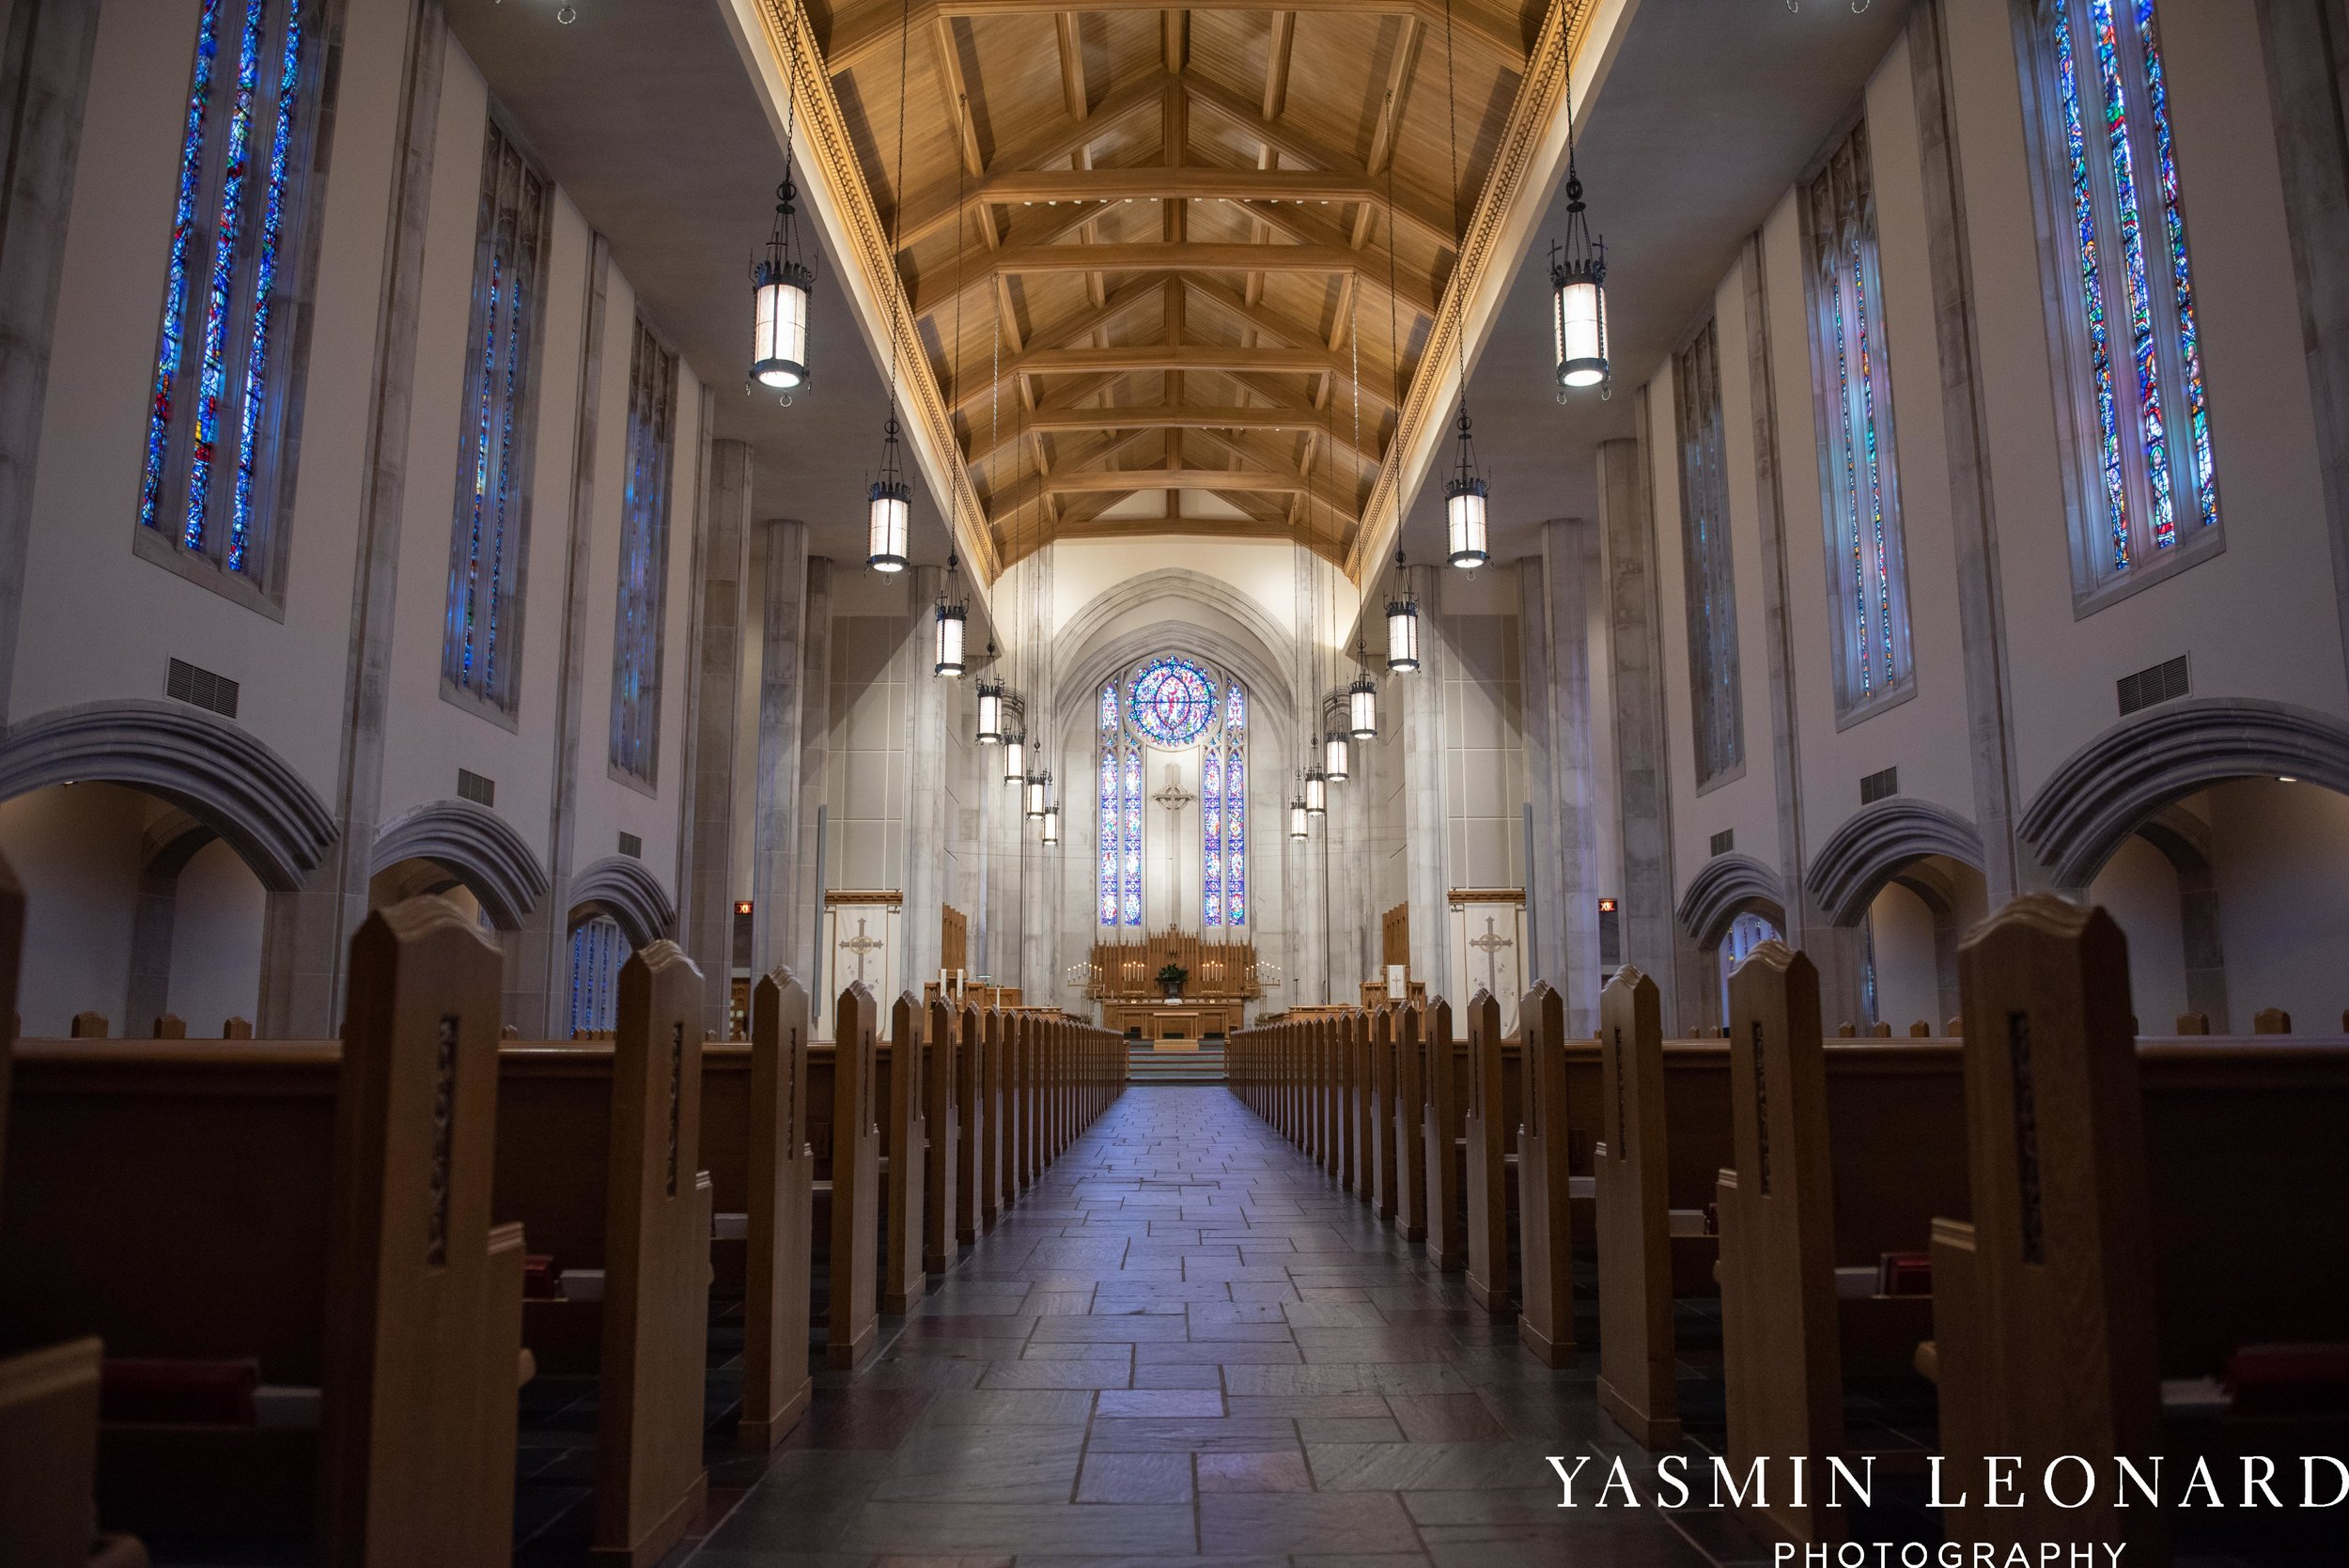 Wesley Memorial United Methodist Church - Old Homeplace Winery - High Point Weddings - High Point Wedding Photographer - NC Weddings - NC Barn Venue - Yasmin Leonard Photography-2.jpg